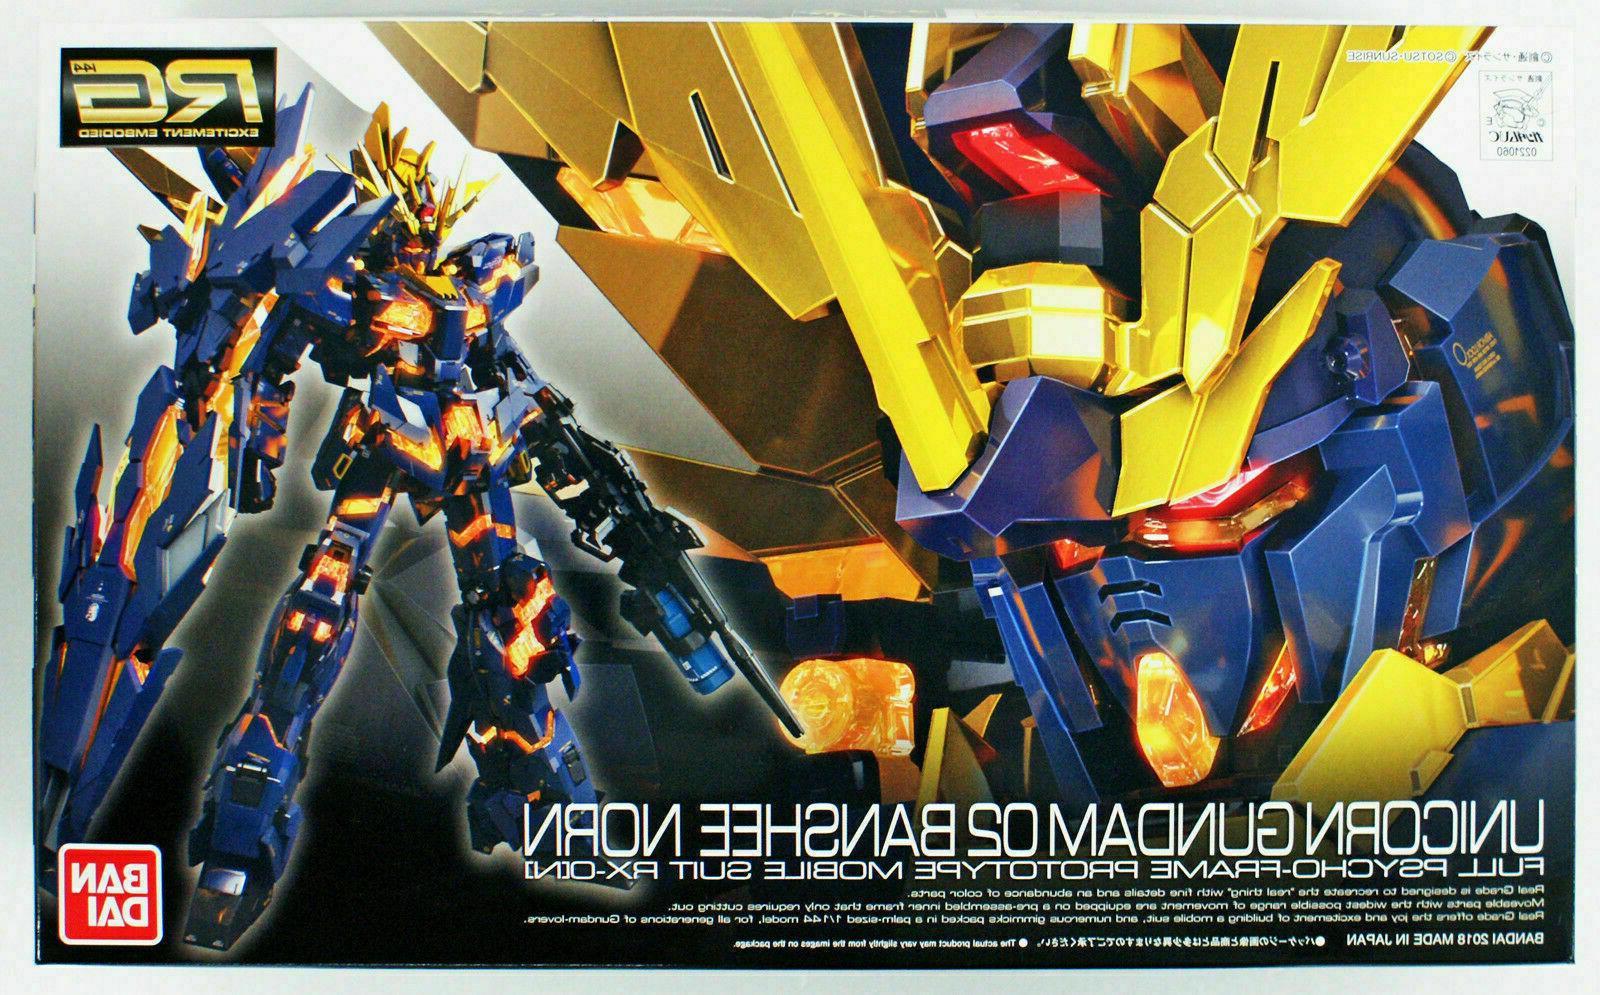 Gundam water SIMP RG 01